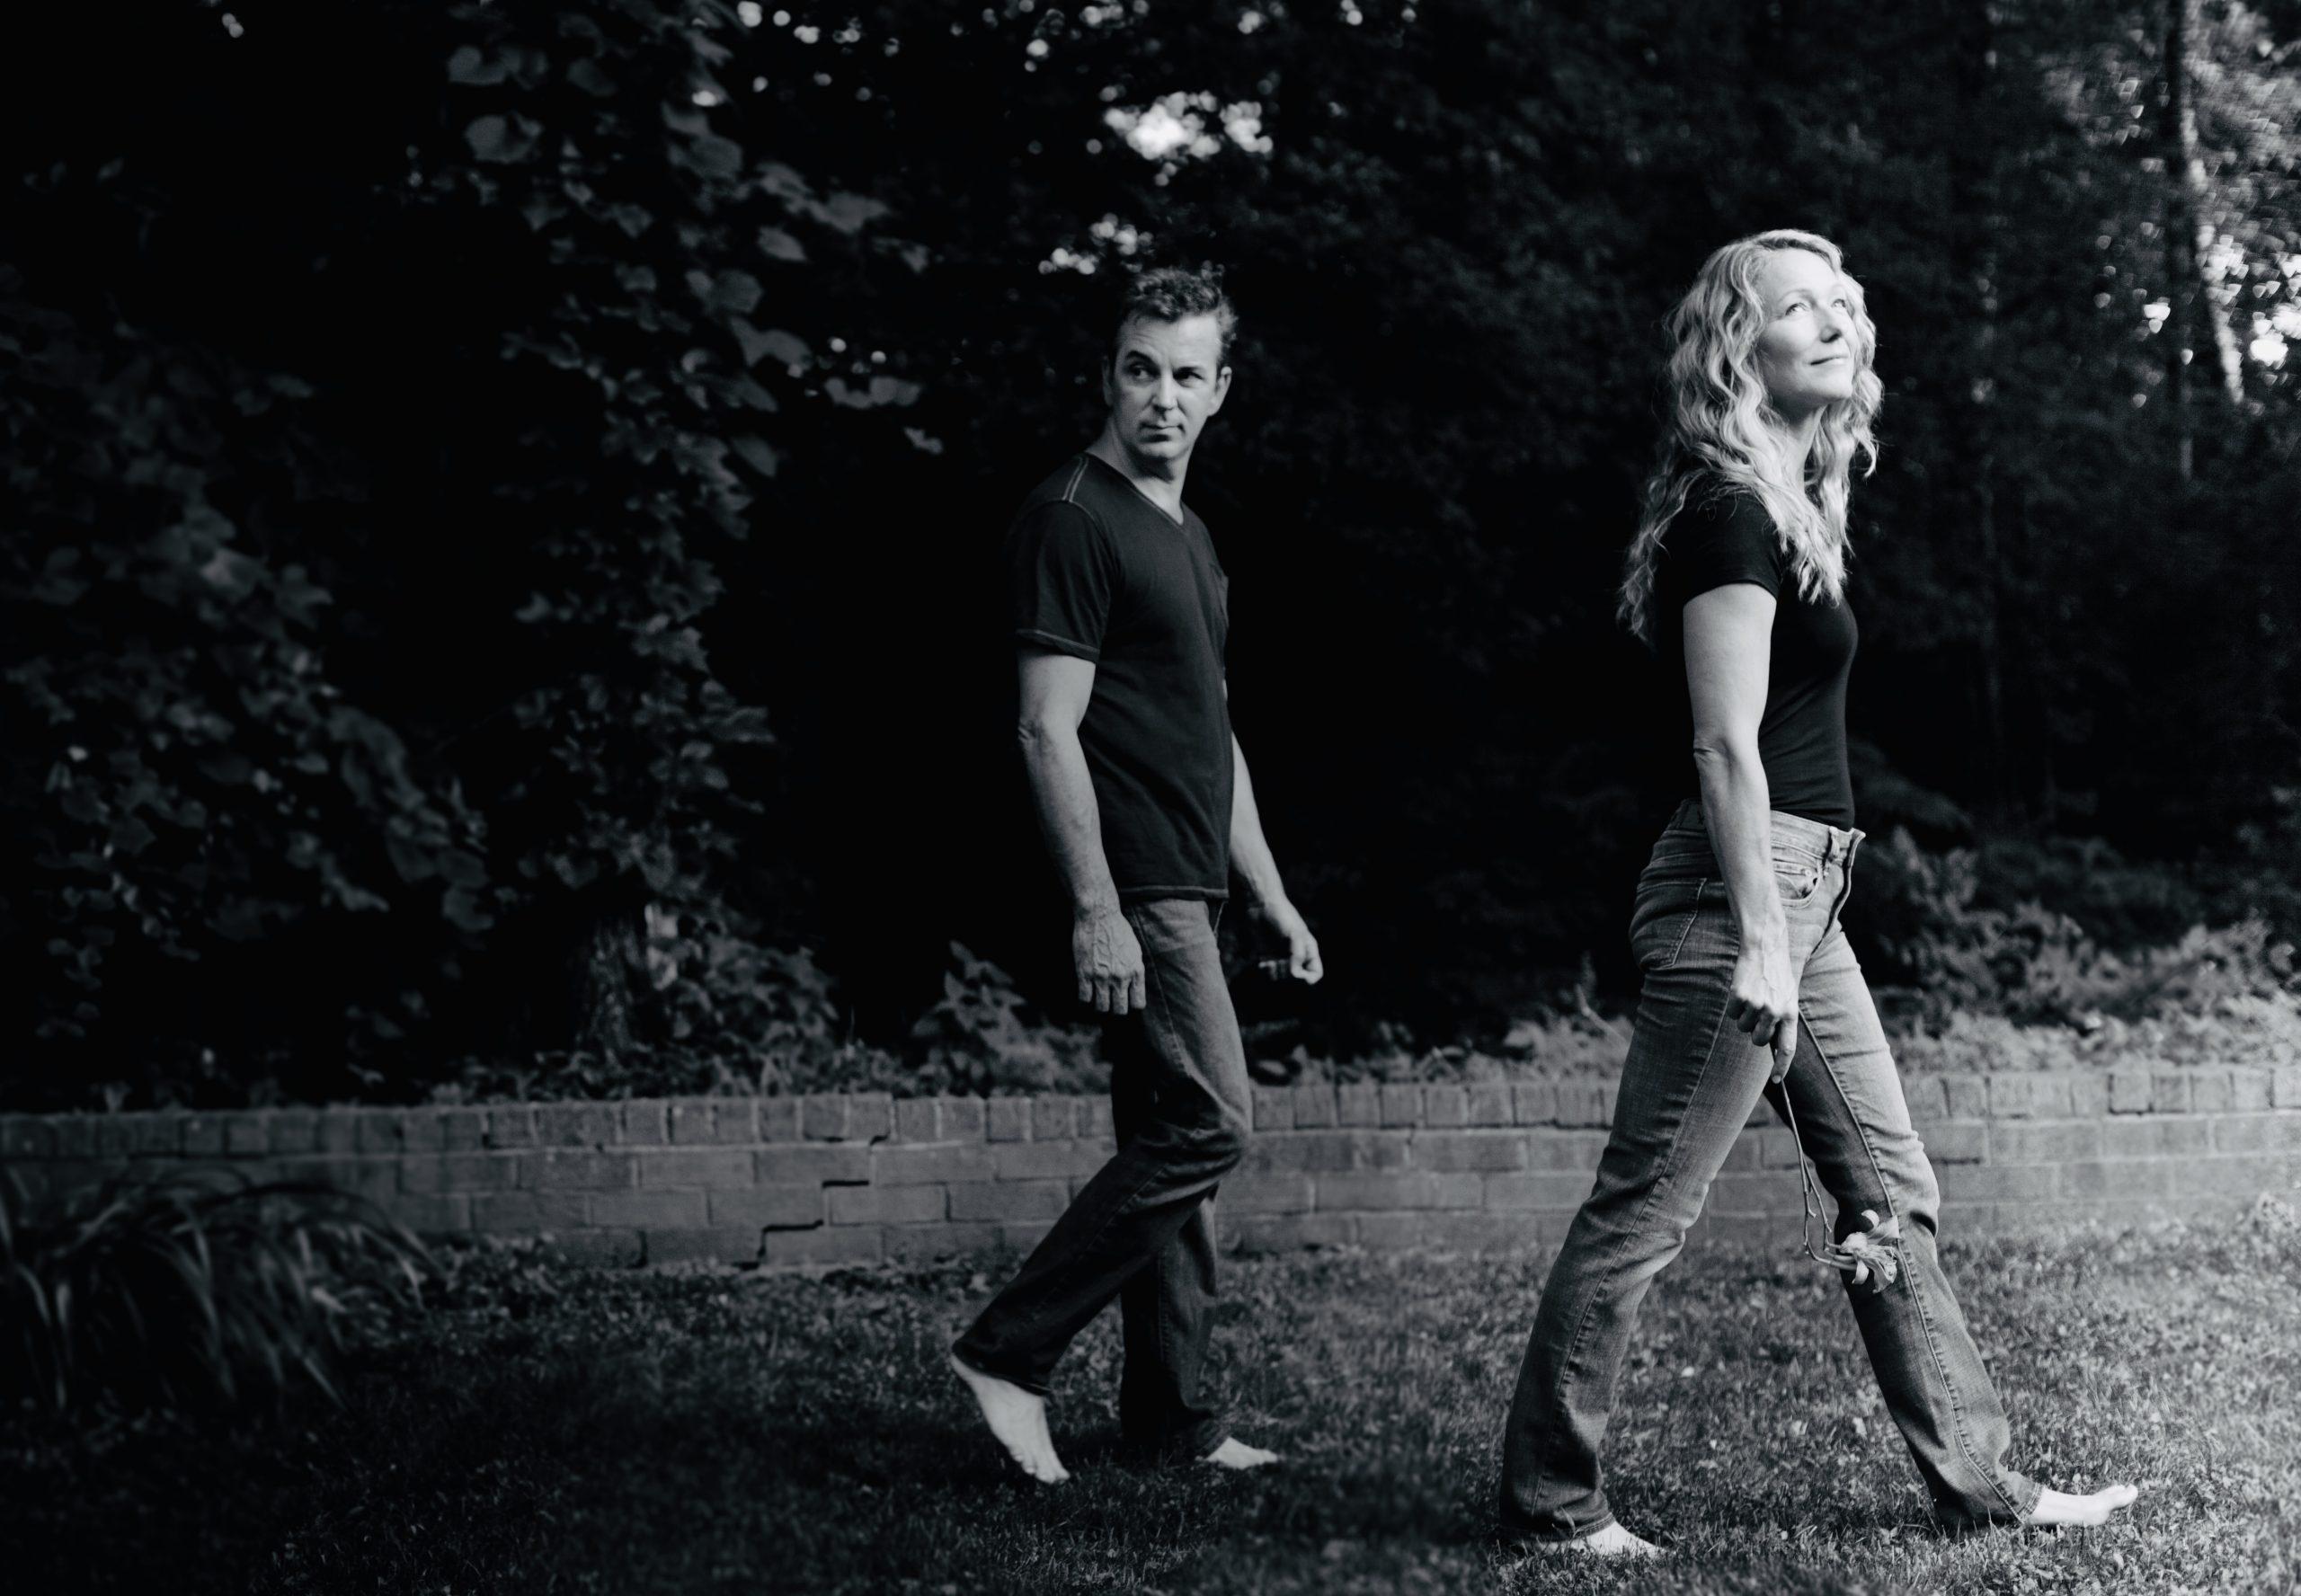 out of the grey aka christine and scott dente walk across a dark lawn toward a bright future